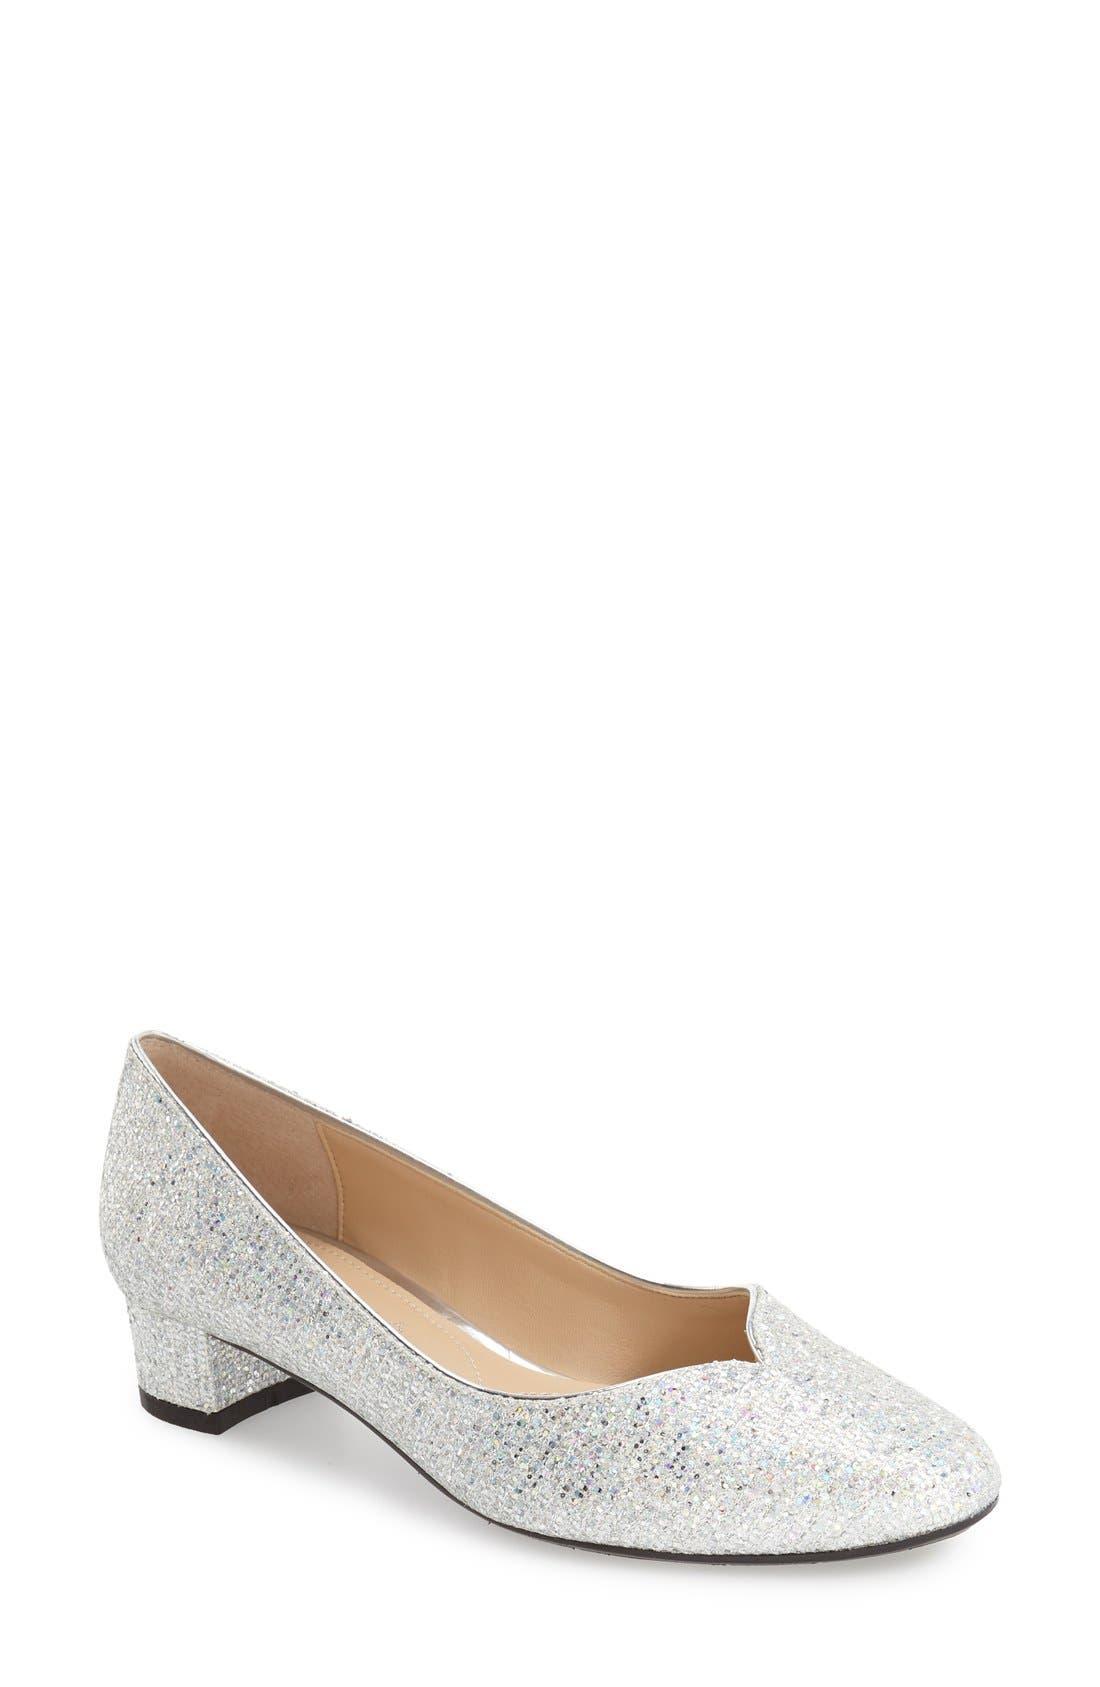 J. Reneé 'Bambalina' Block Heel Glitter Pump (Women)